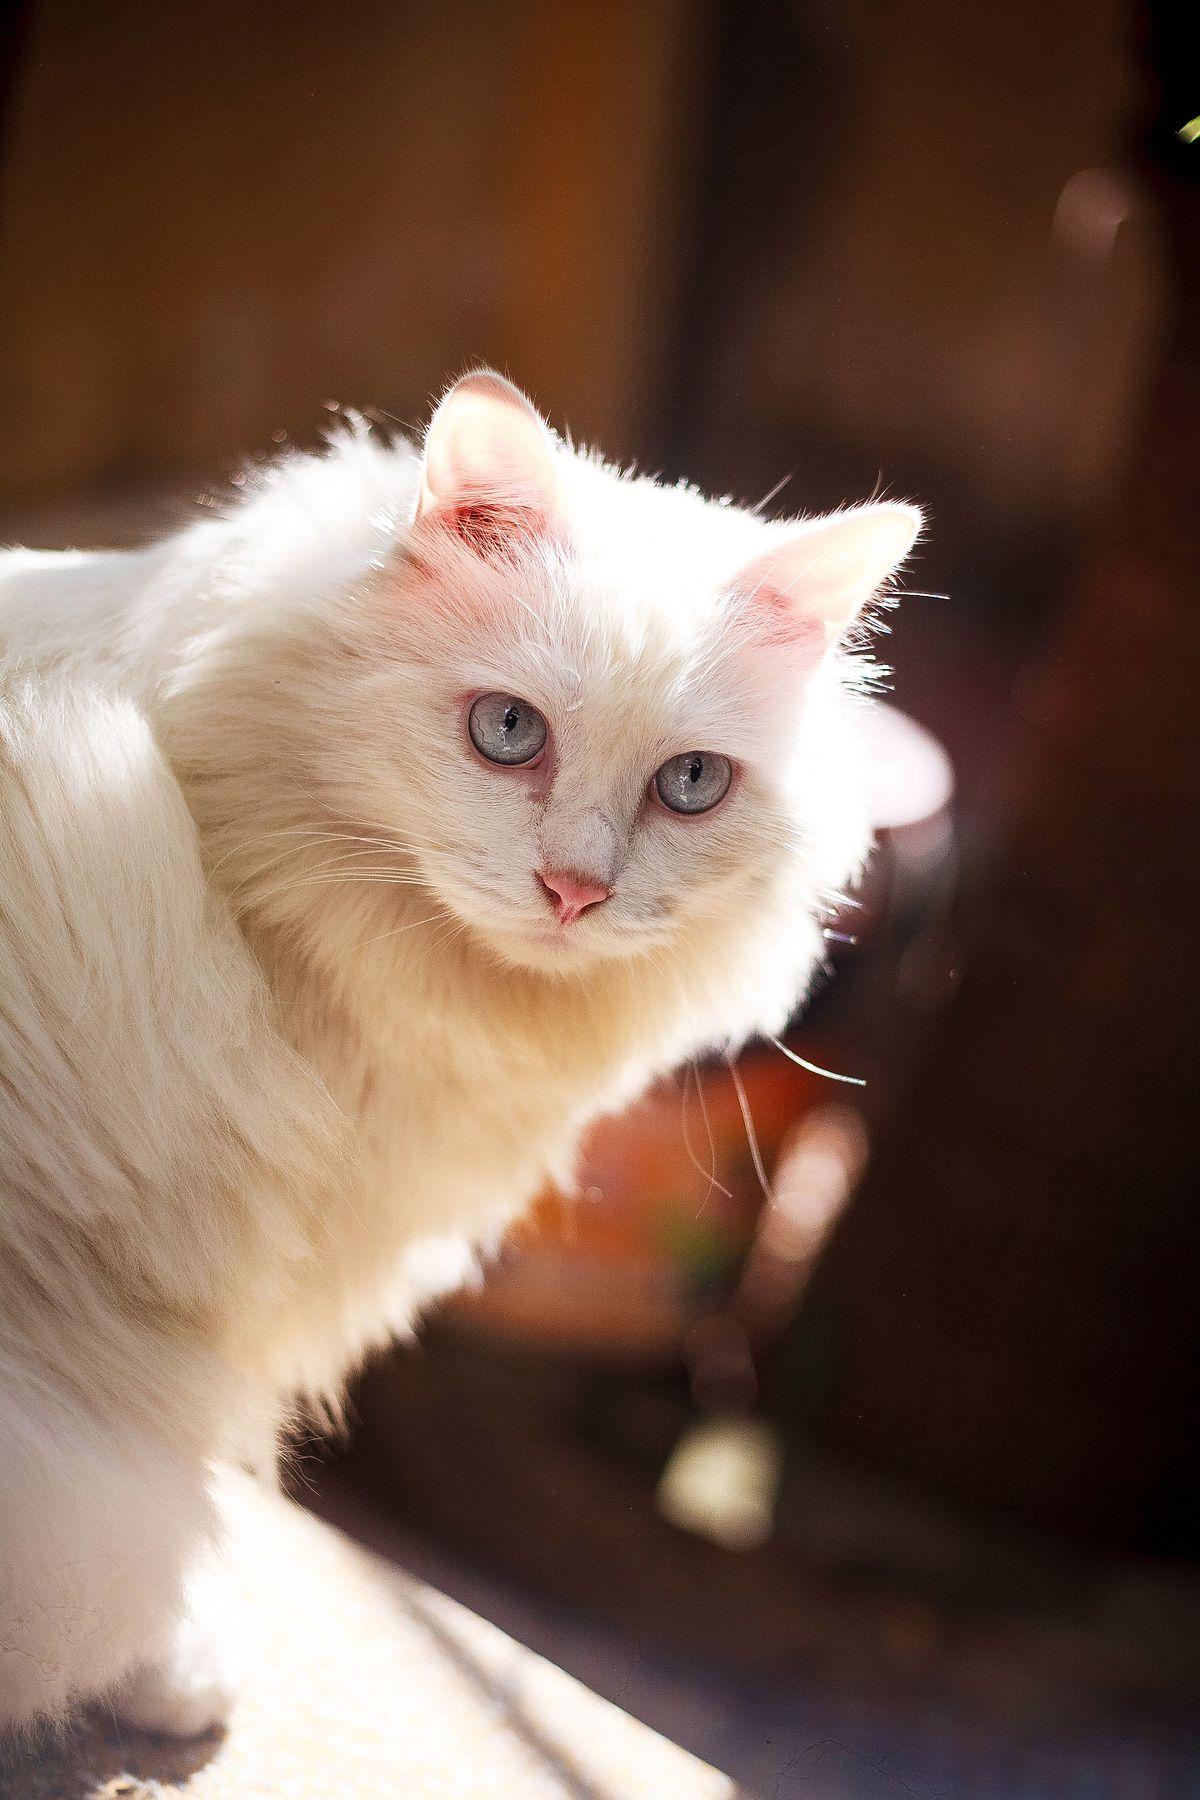 Congenital sensorineural deafness in cats - Wikipedia